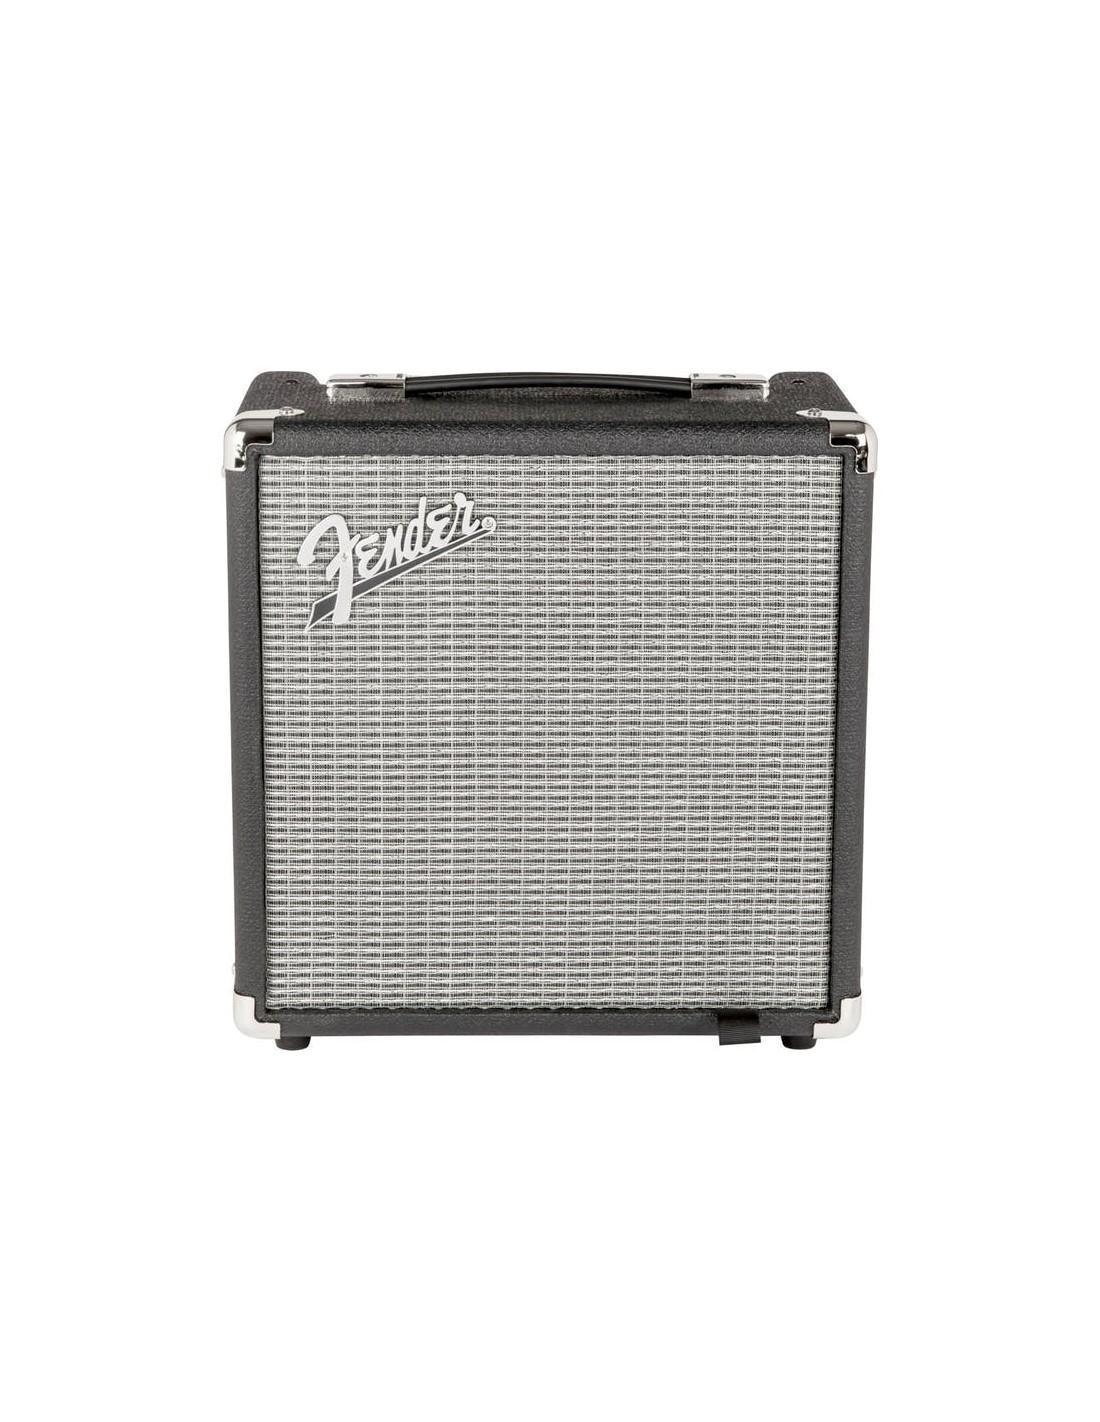 fender rumble 15 v3 15 watt portable combo bass amplifier. Black Bedroom Furniture Sets. Home Design Ideas